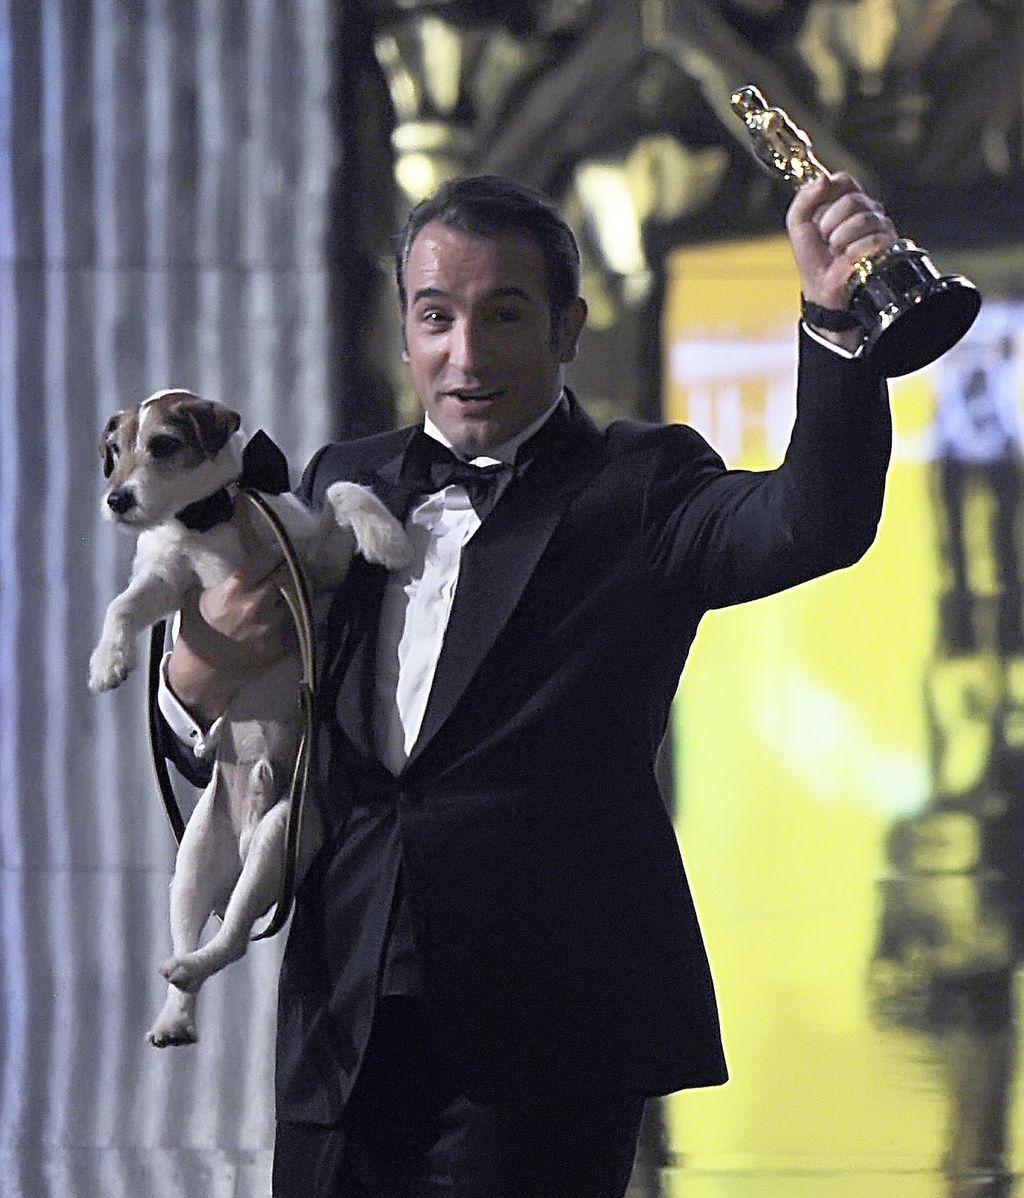 Jean Dujardin, Mejor actor  protagonista por 'The Artist'